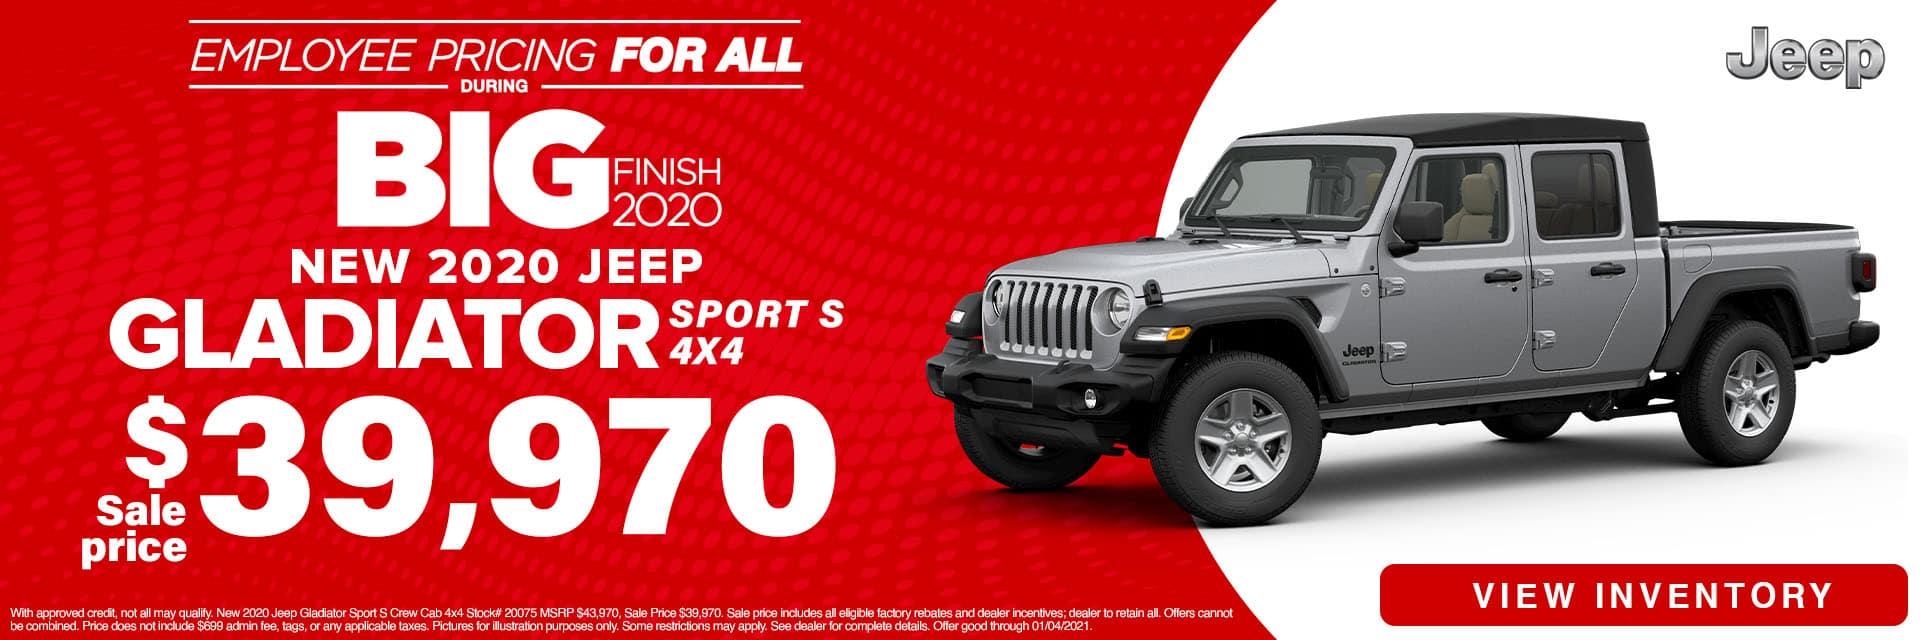 CLGO-December 2020-2020 Jeep Gladiator